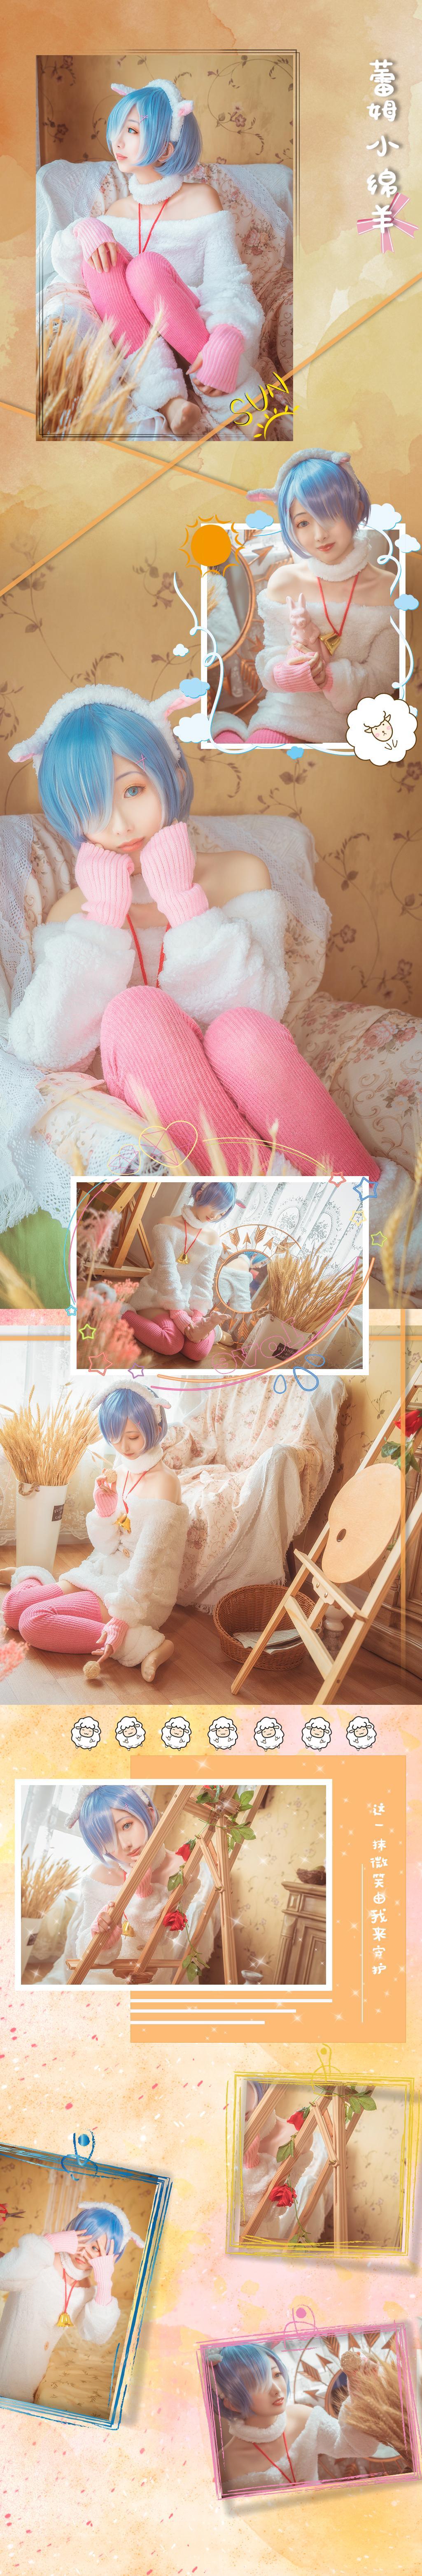 《RE:从零开始的异世界生活》正片cosplay【CN:珸茗】-第3张